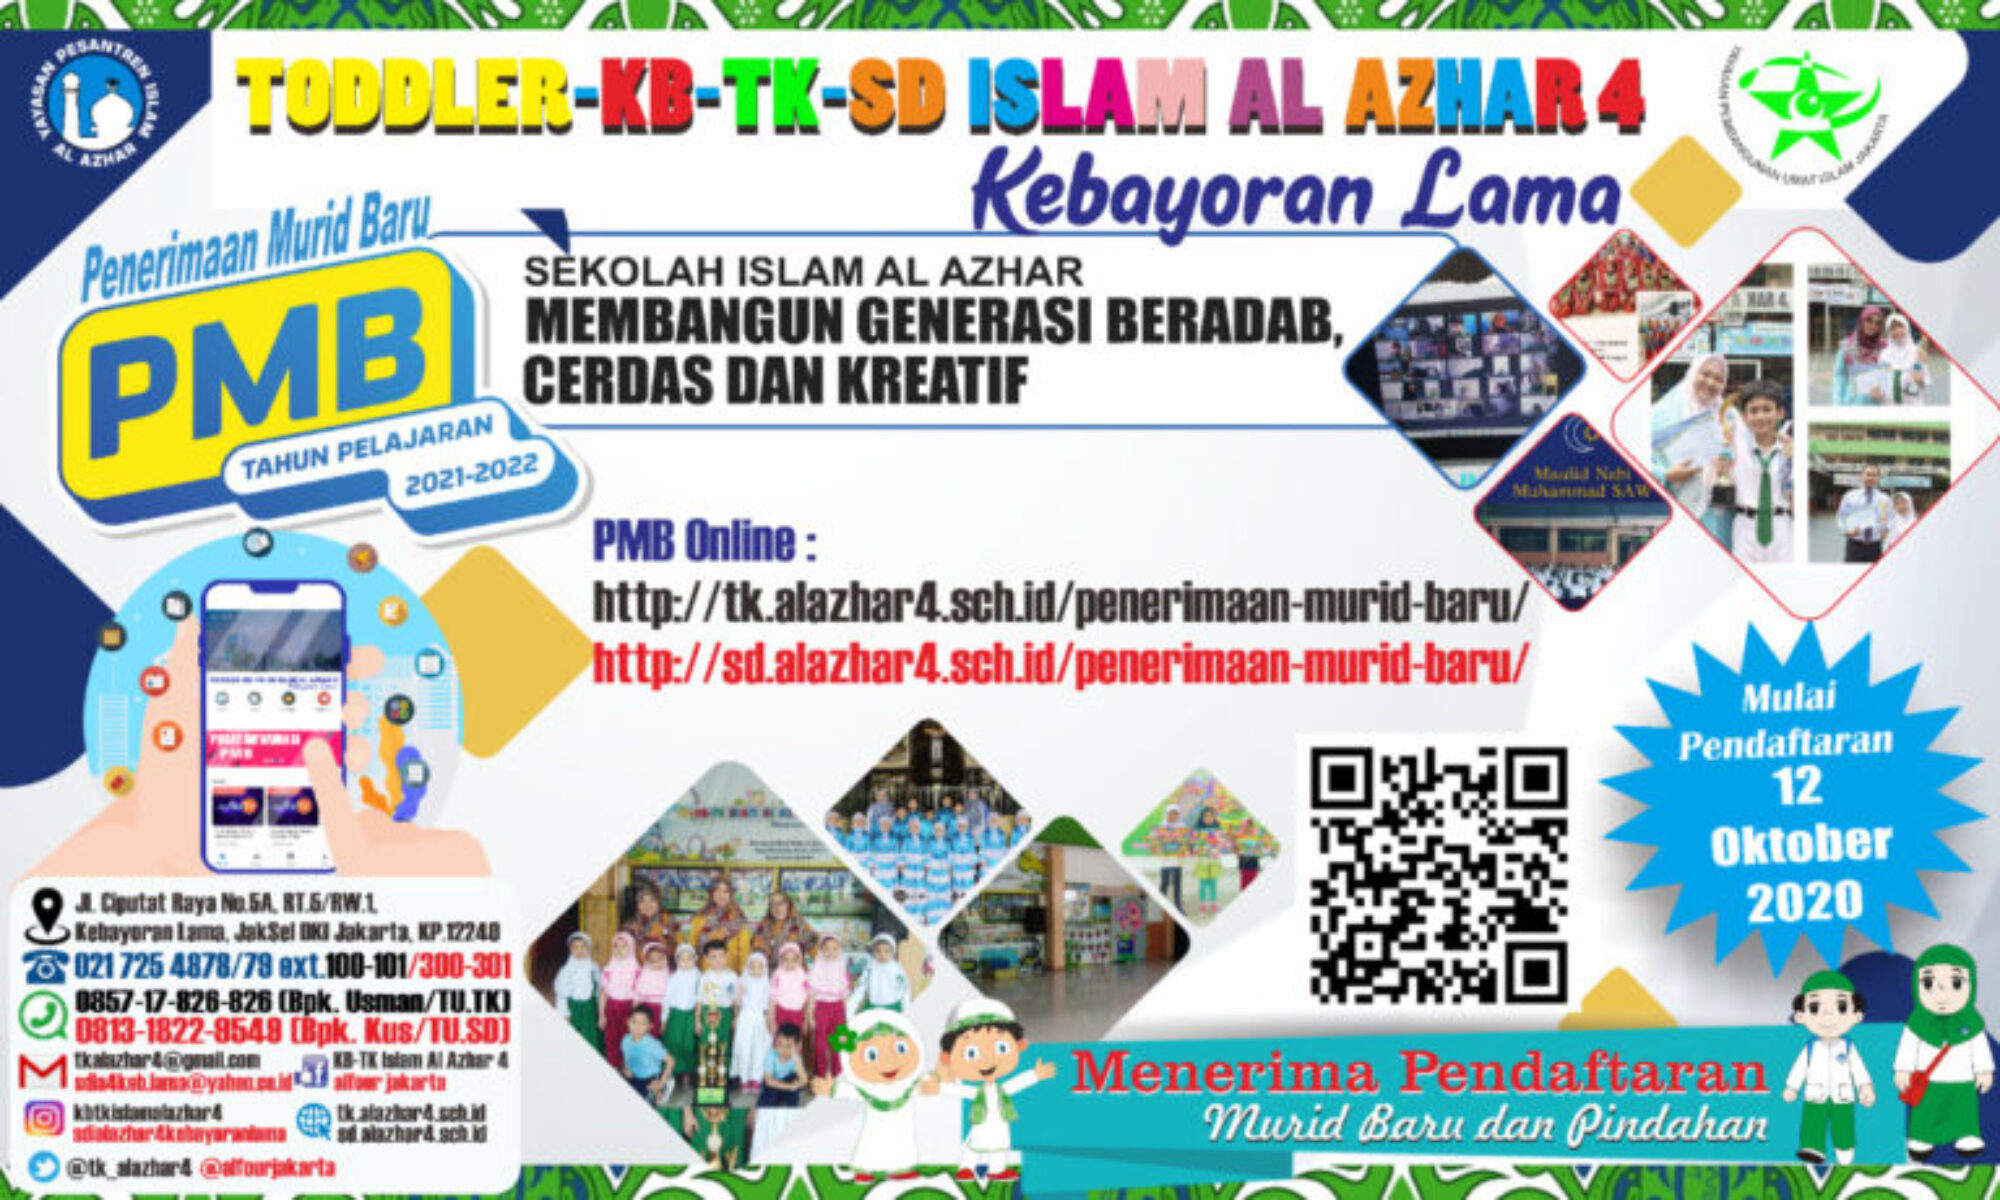 TODDLER-KB-TK ISLAM AL AZHAR 4